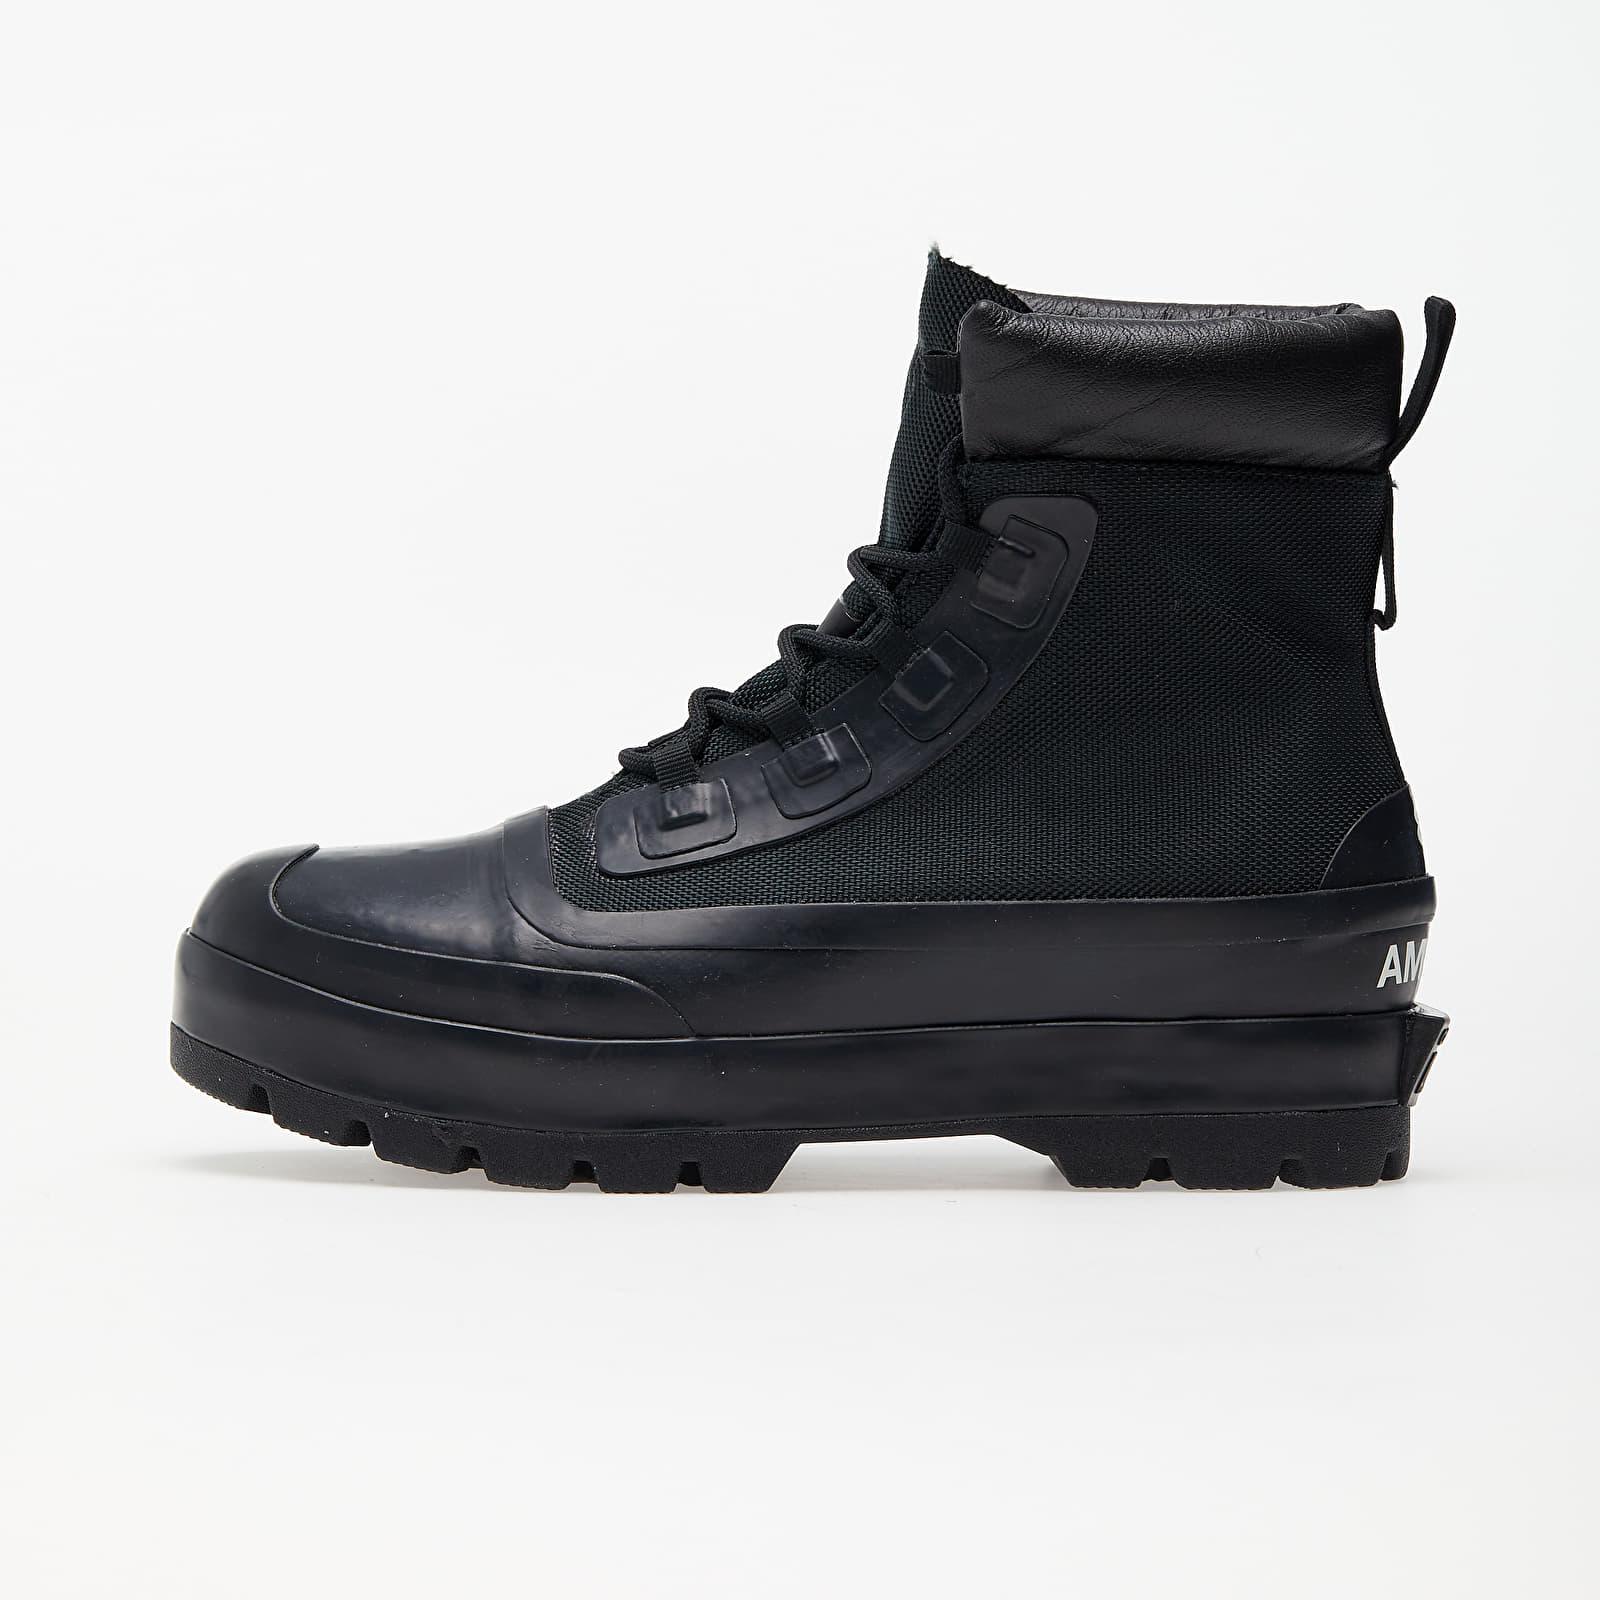 Converse x Ambush Chuck Taylor All Star Duck BOOT Black/ Black/ Black 170588C